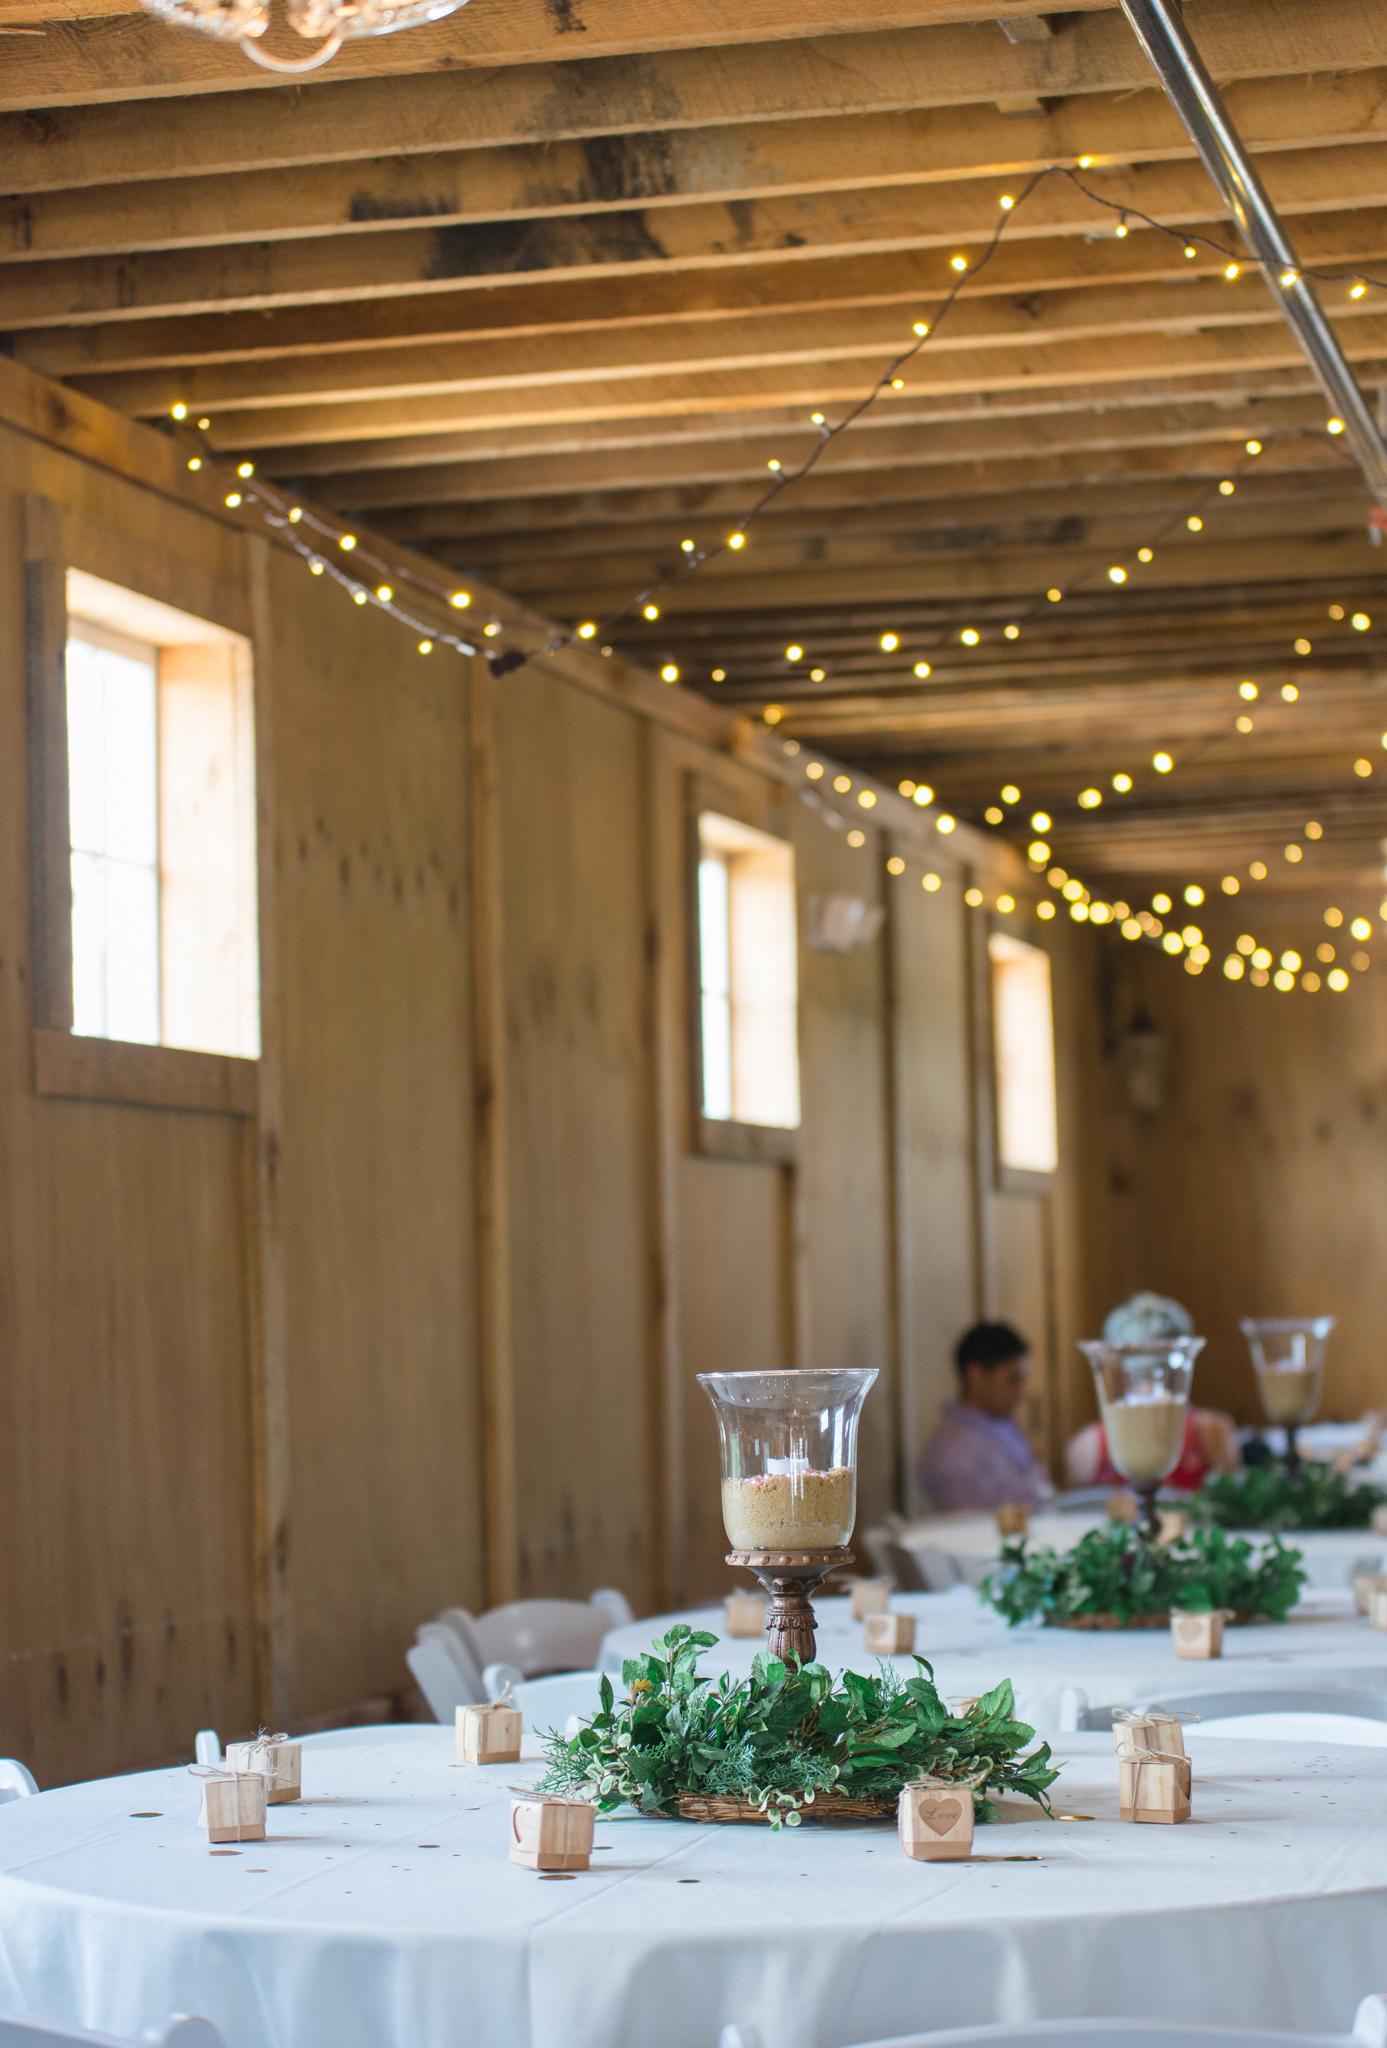 wedding details, wedding barn, Josephina Event Venue, Dry Ridge, Kentucky wedding barn